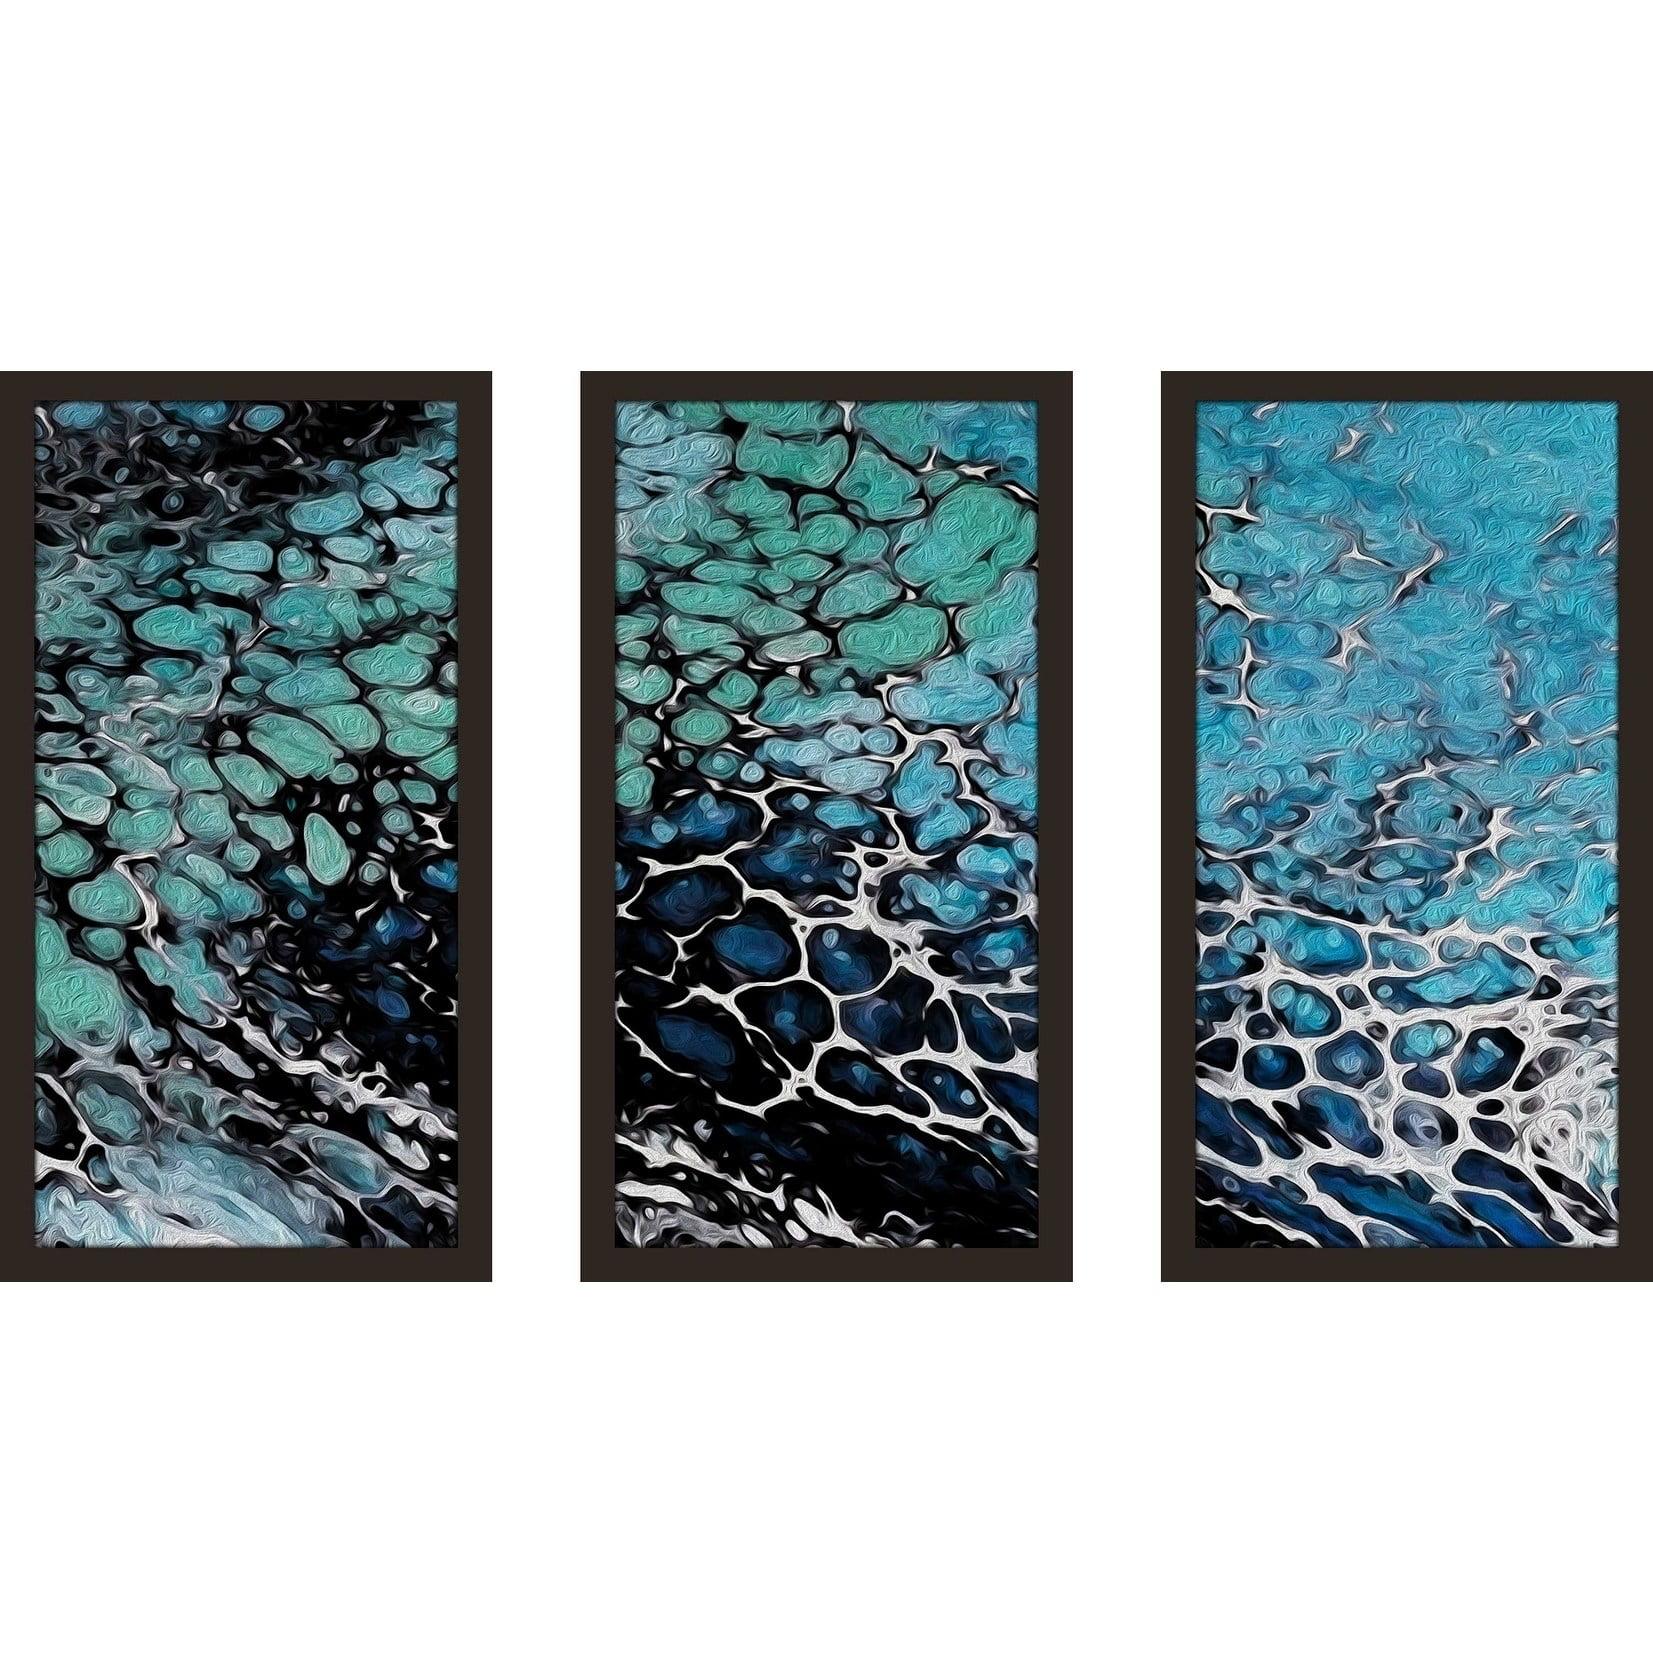 Global Gallery Anne Tavoletti Beach Divas VII Color Giclee Stretched Canvas Artwork 24 x 24